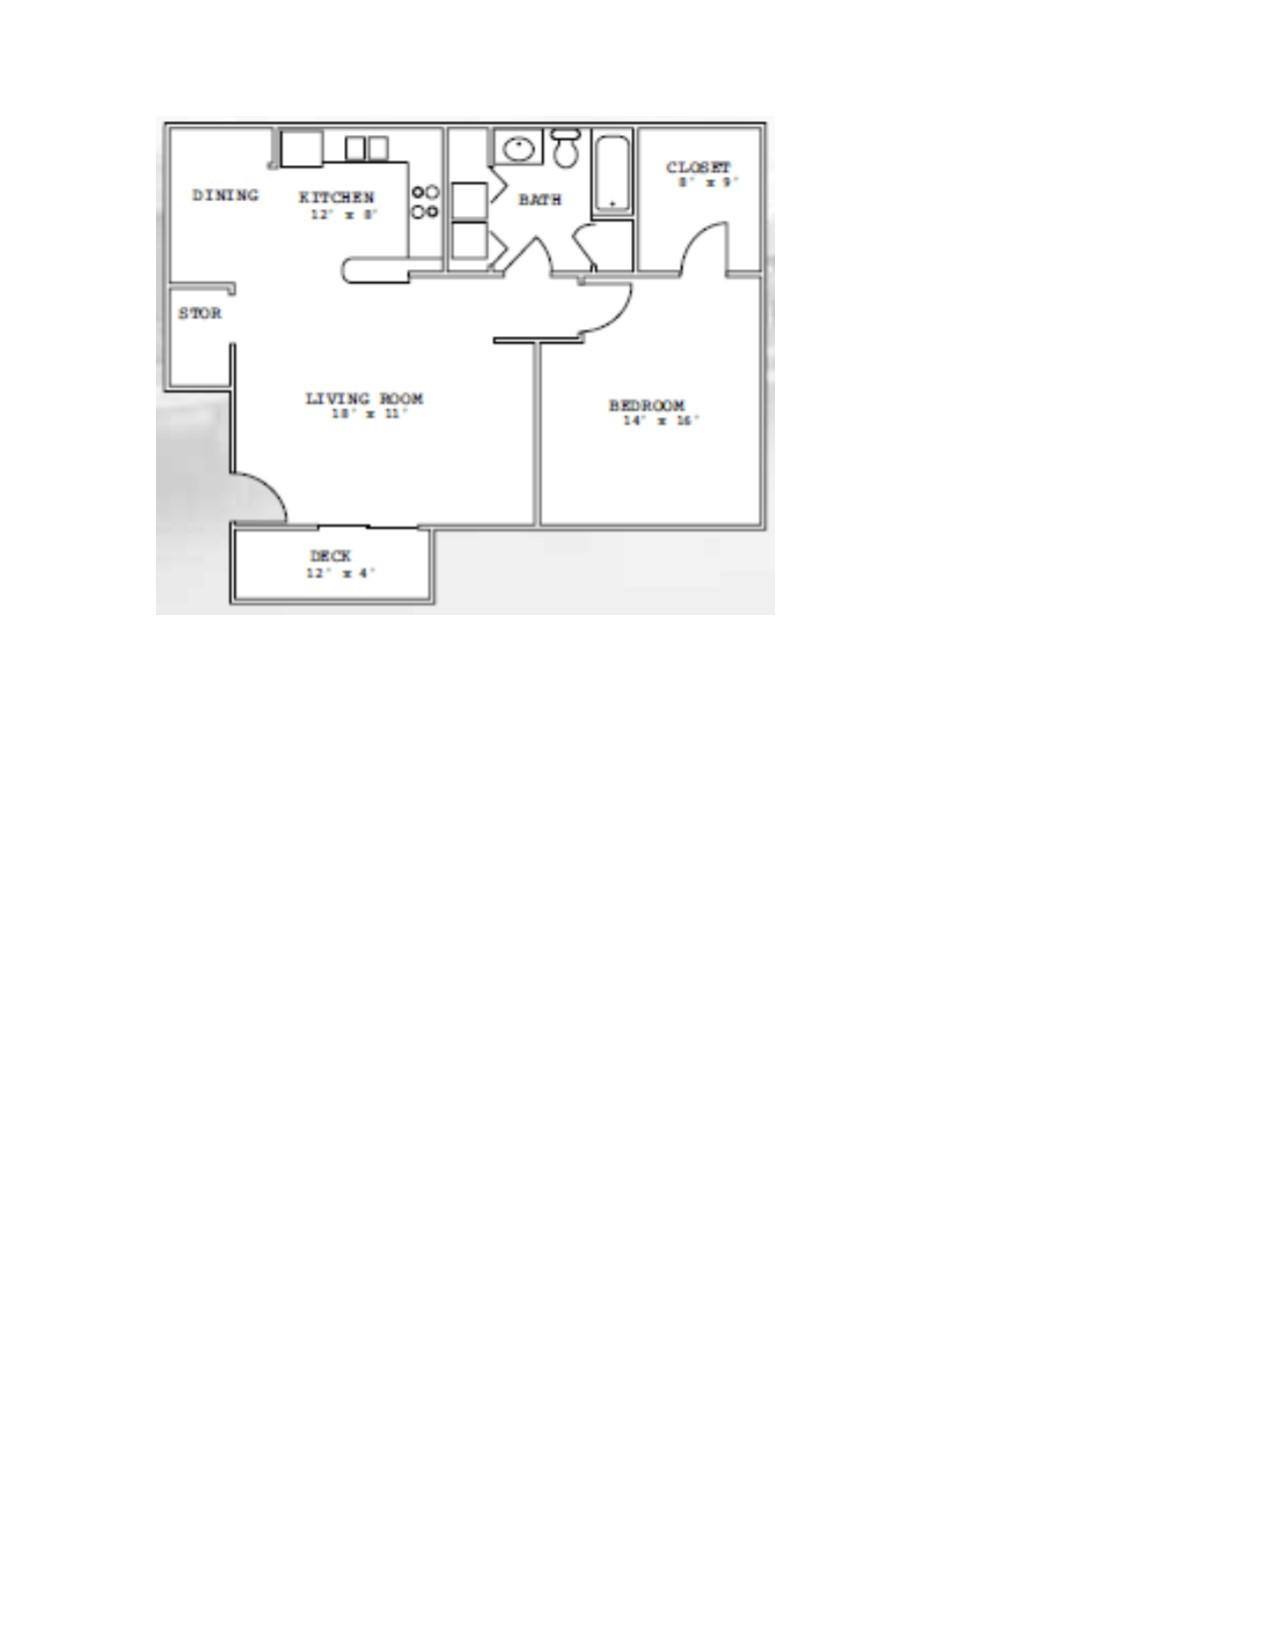 2881-09 Floorplan